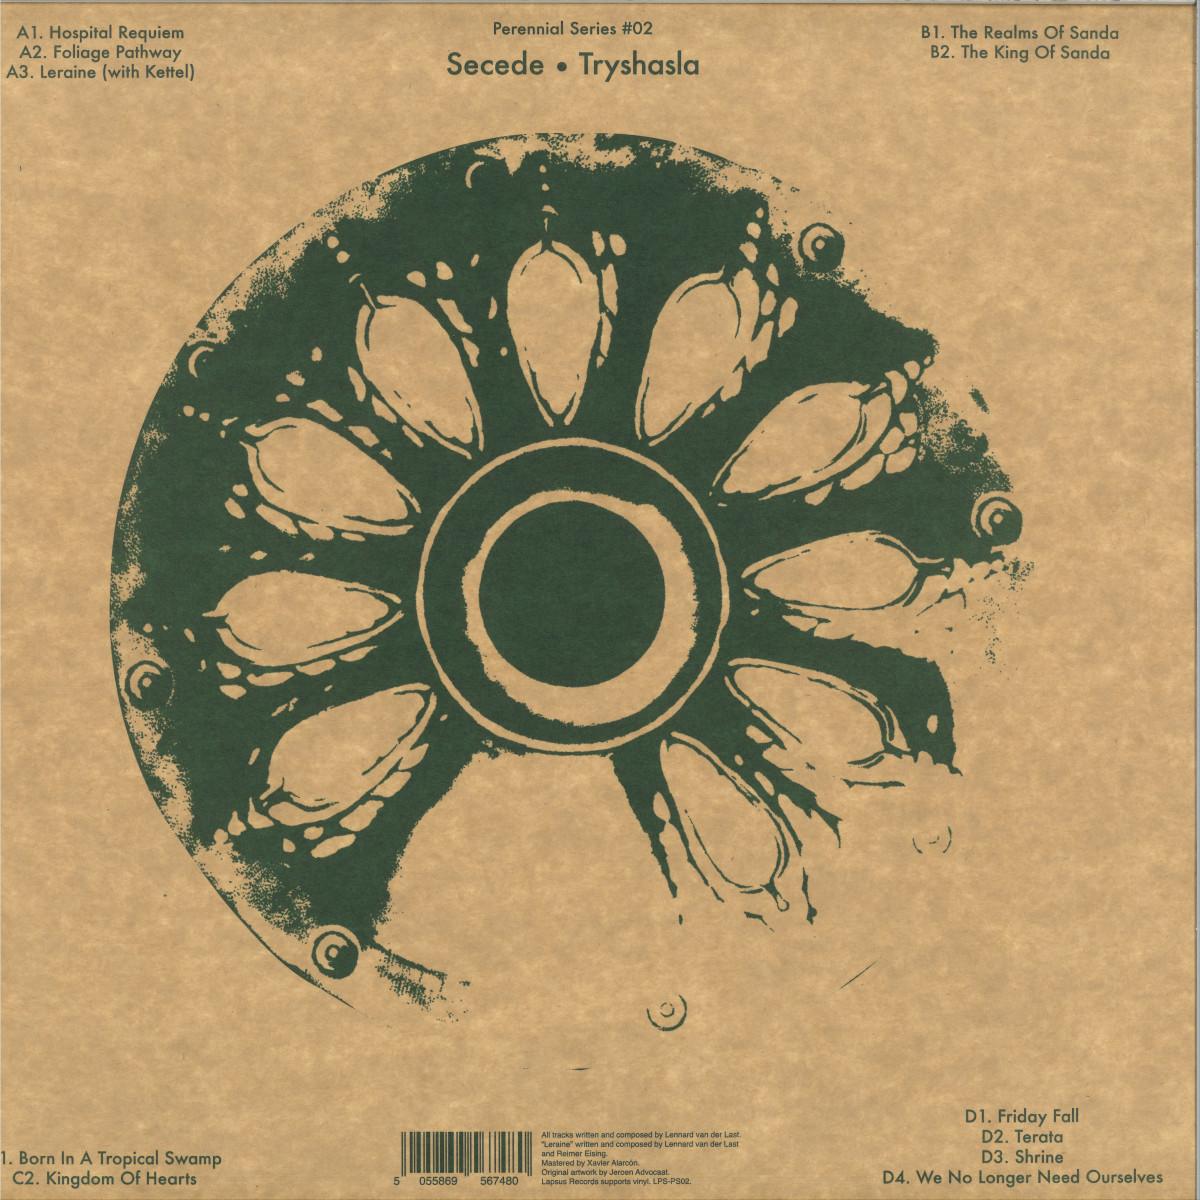 deejay de - Lapsus Records